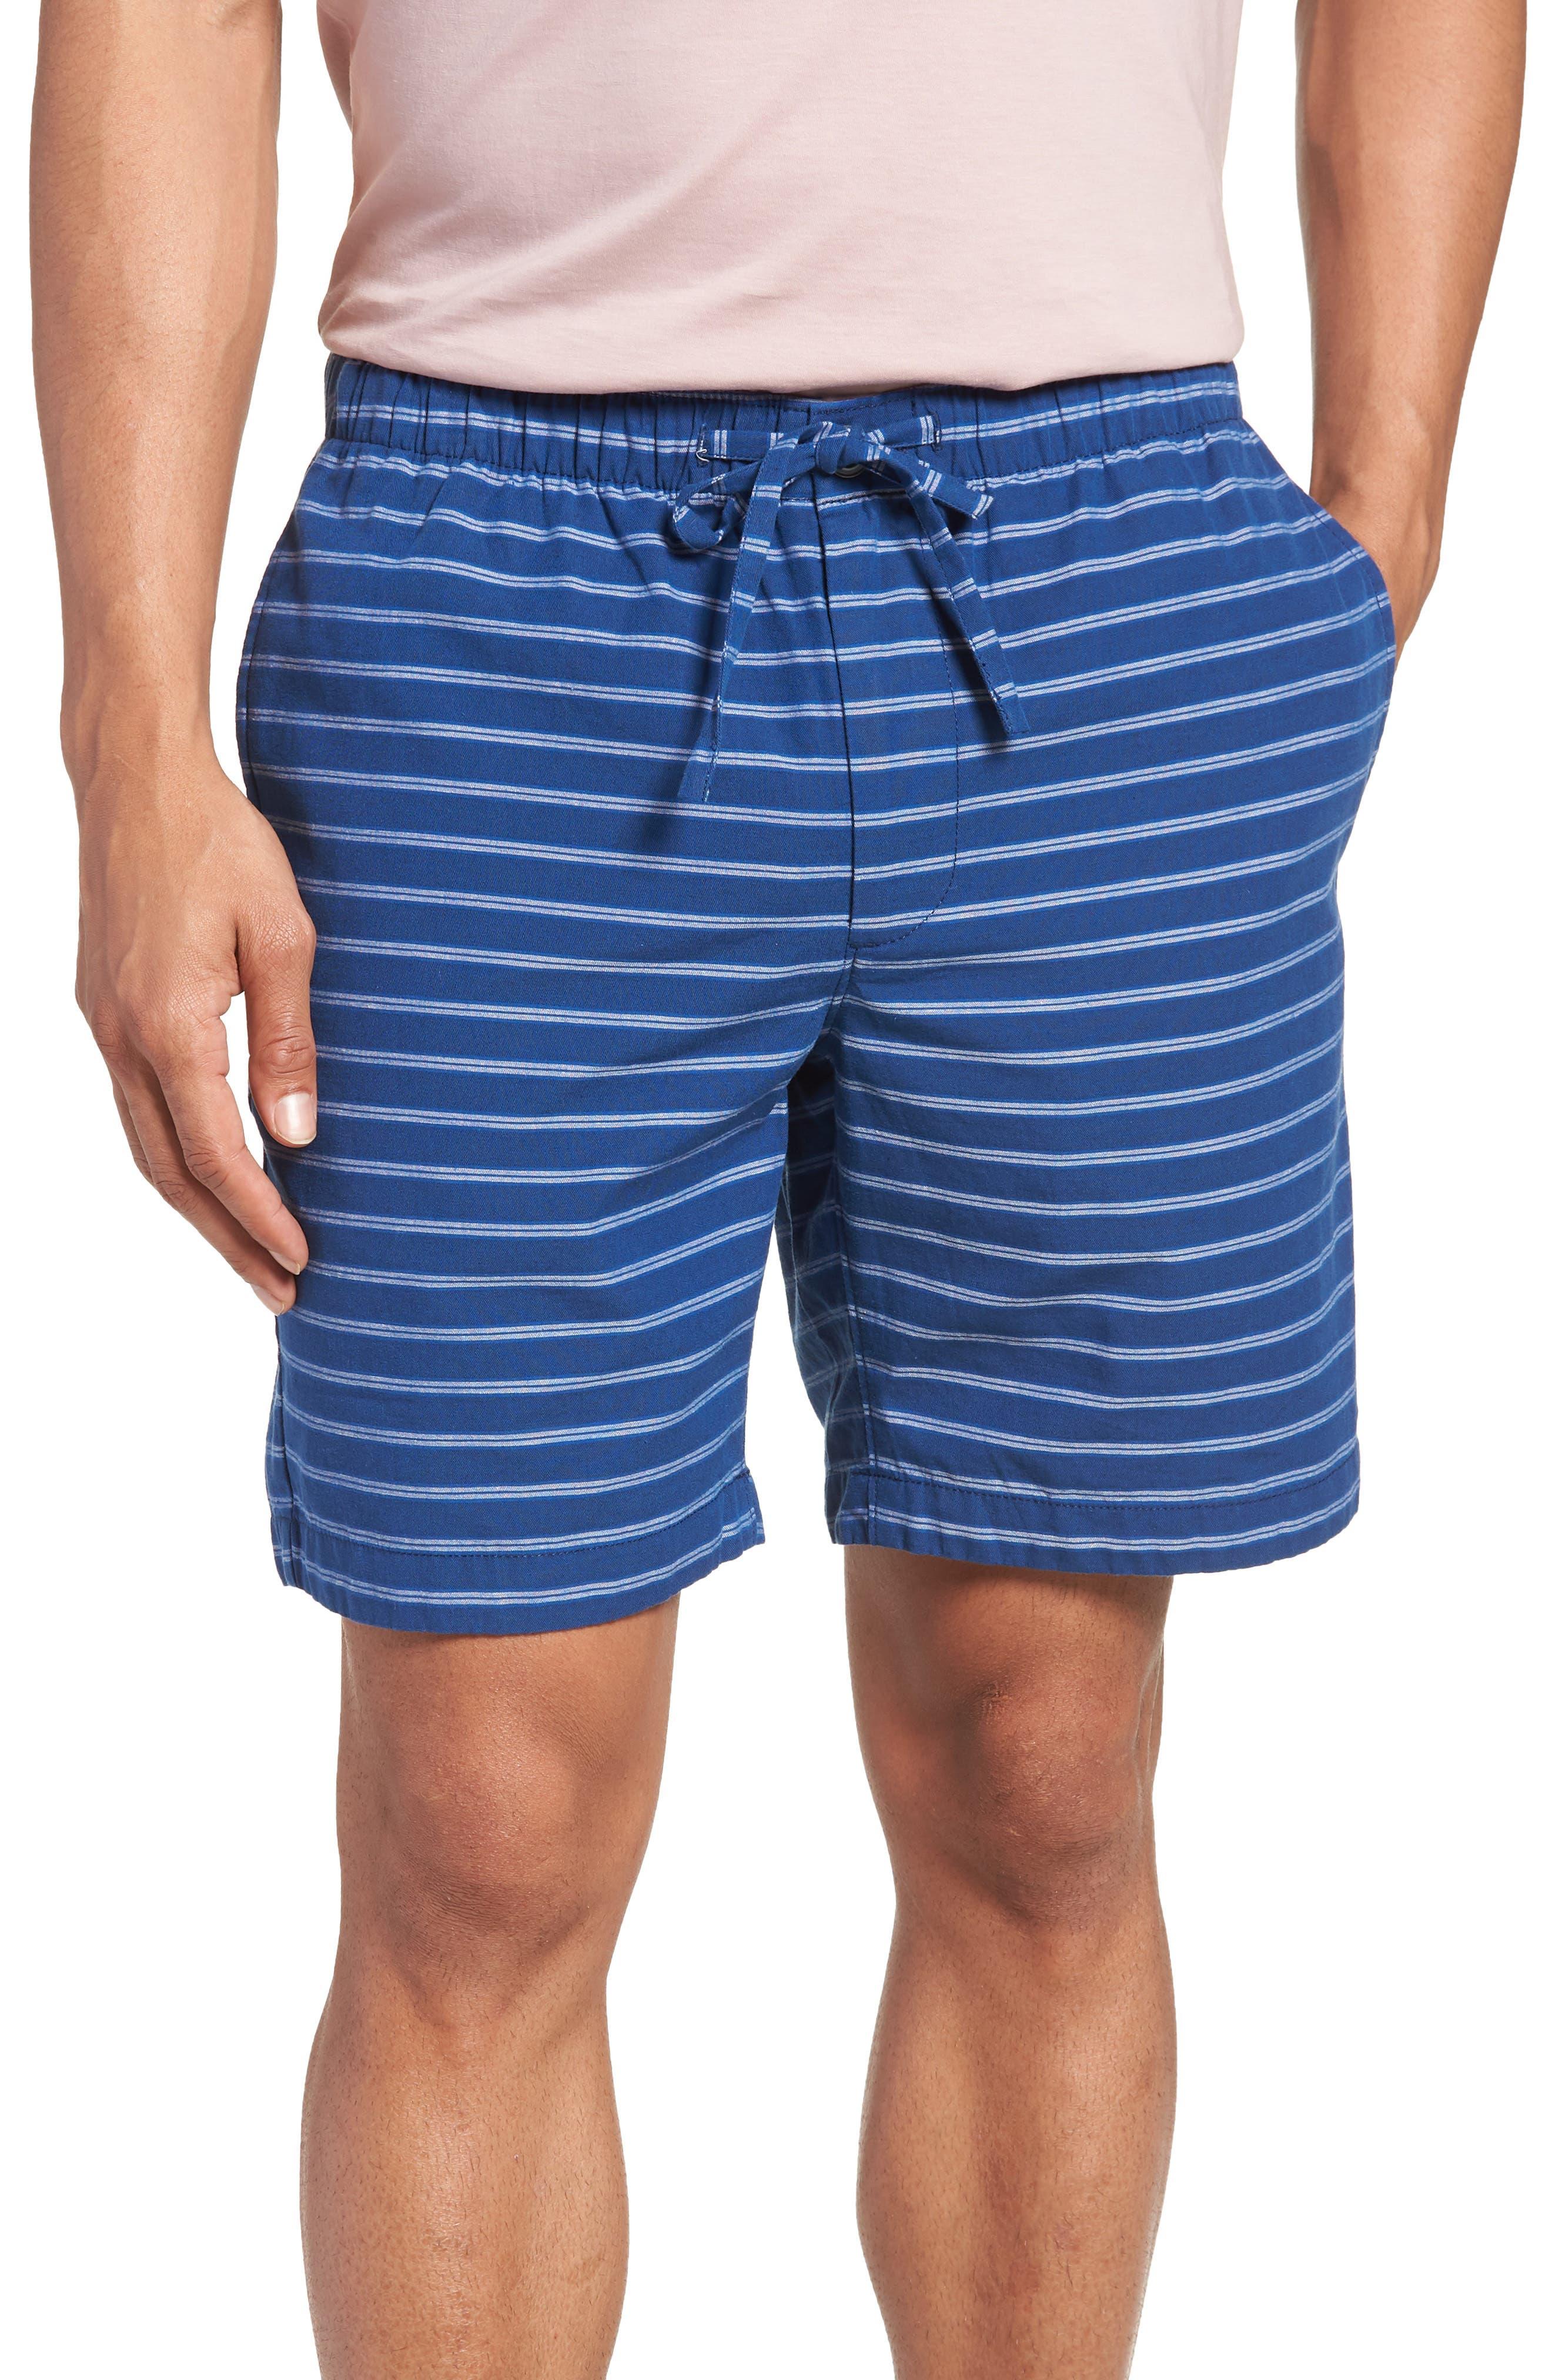 Slim Fit Stripe Beach Shorts,                             Main thumbnail 1, color,                             Blue Stripe